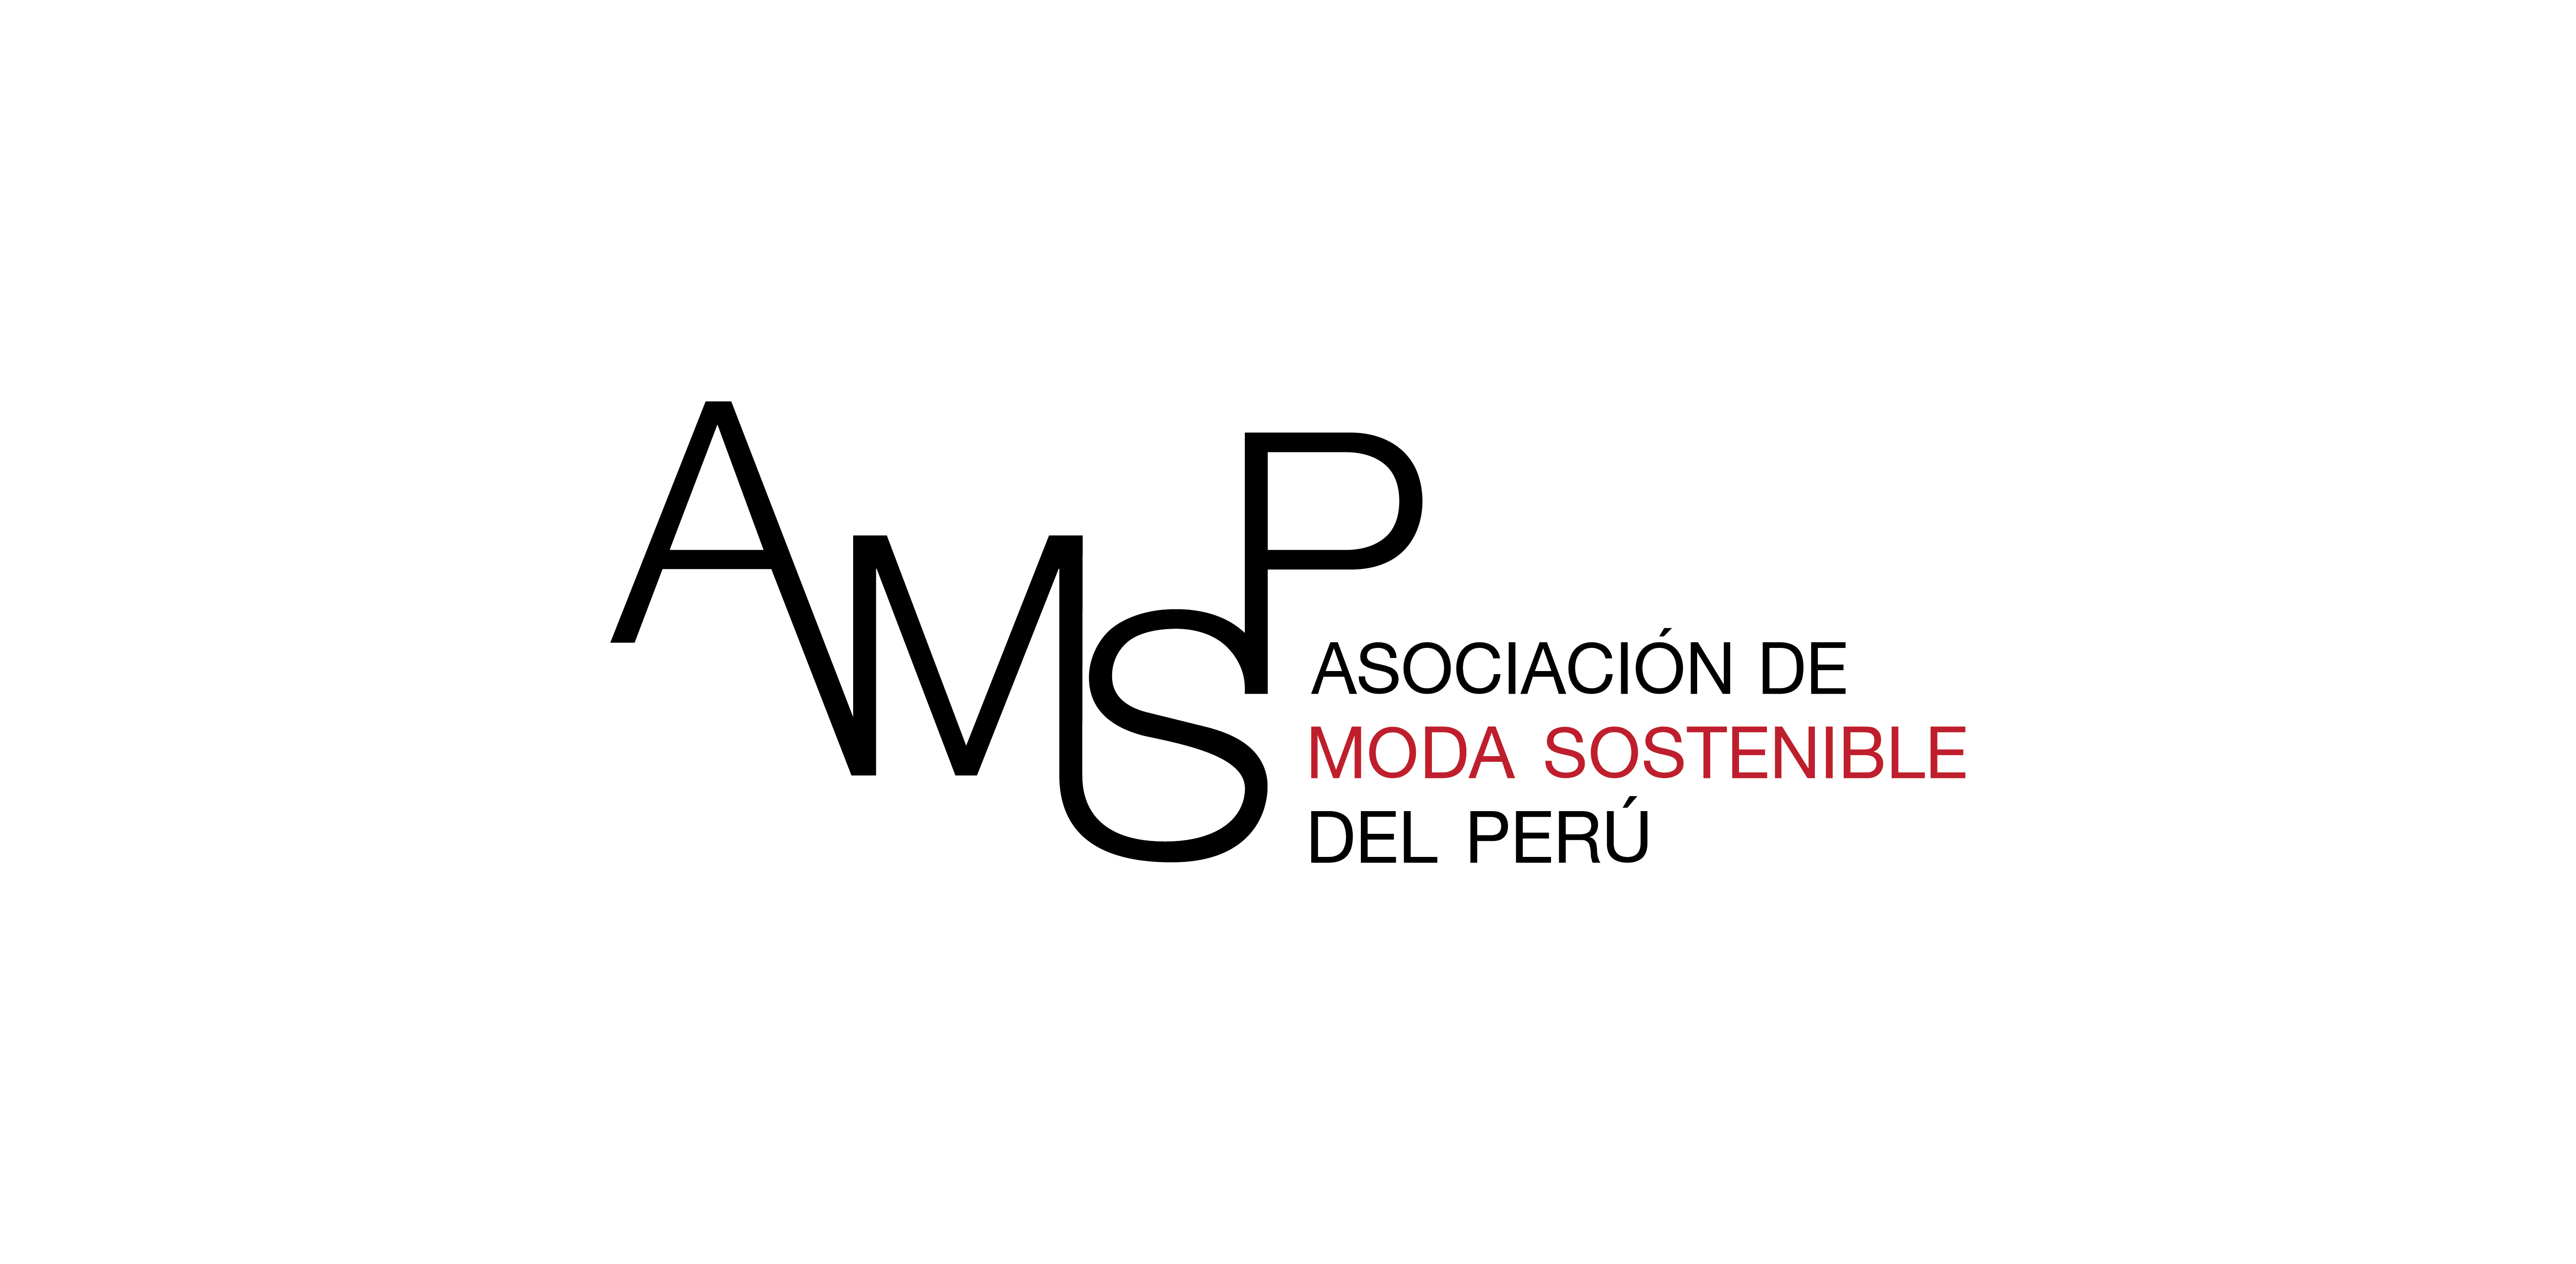 AMSP.jpg.9ityrr9